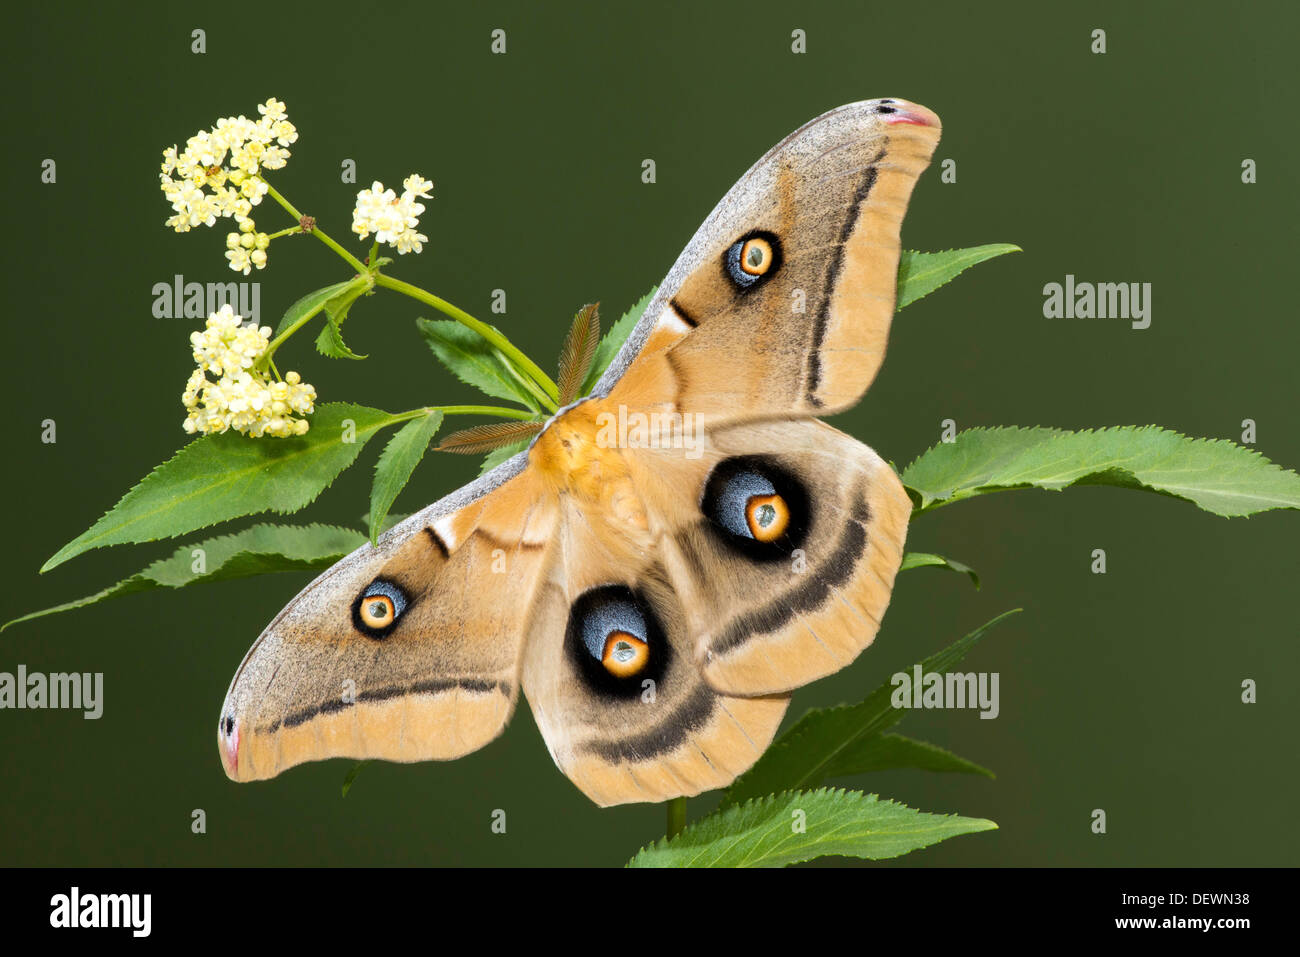 Polyphemus Moth Antheraea polyphemus Tucson, Arizona, United States 15 August Adult Saturniidae - Stock Image